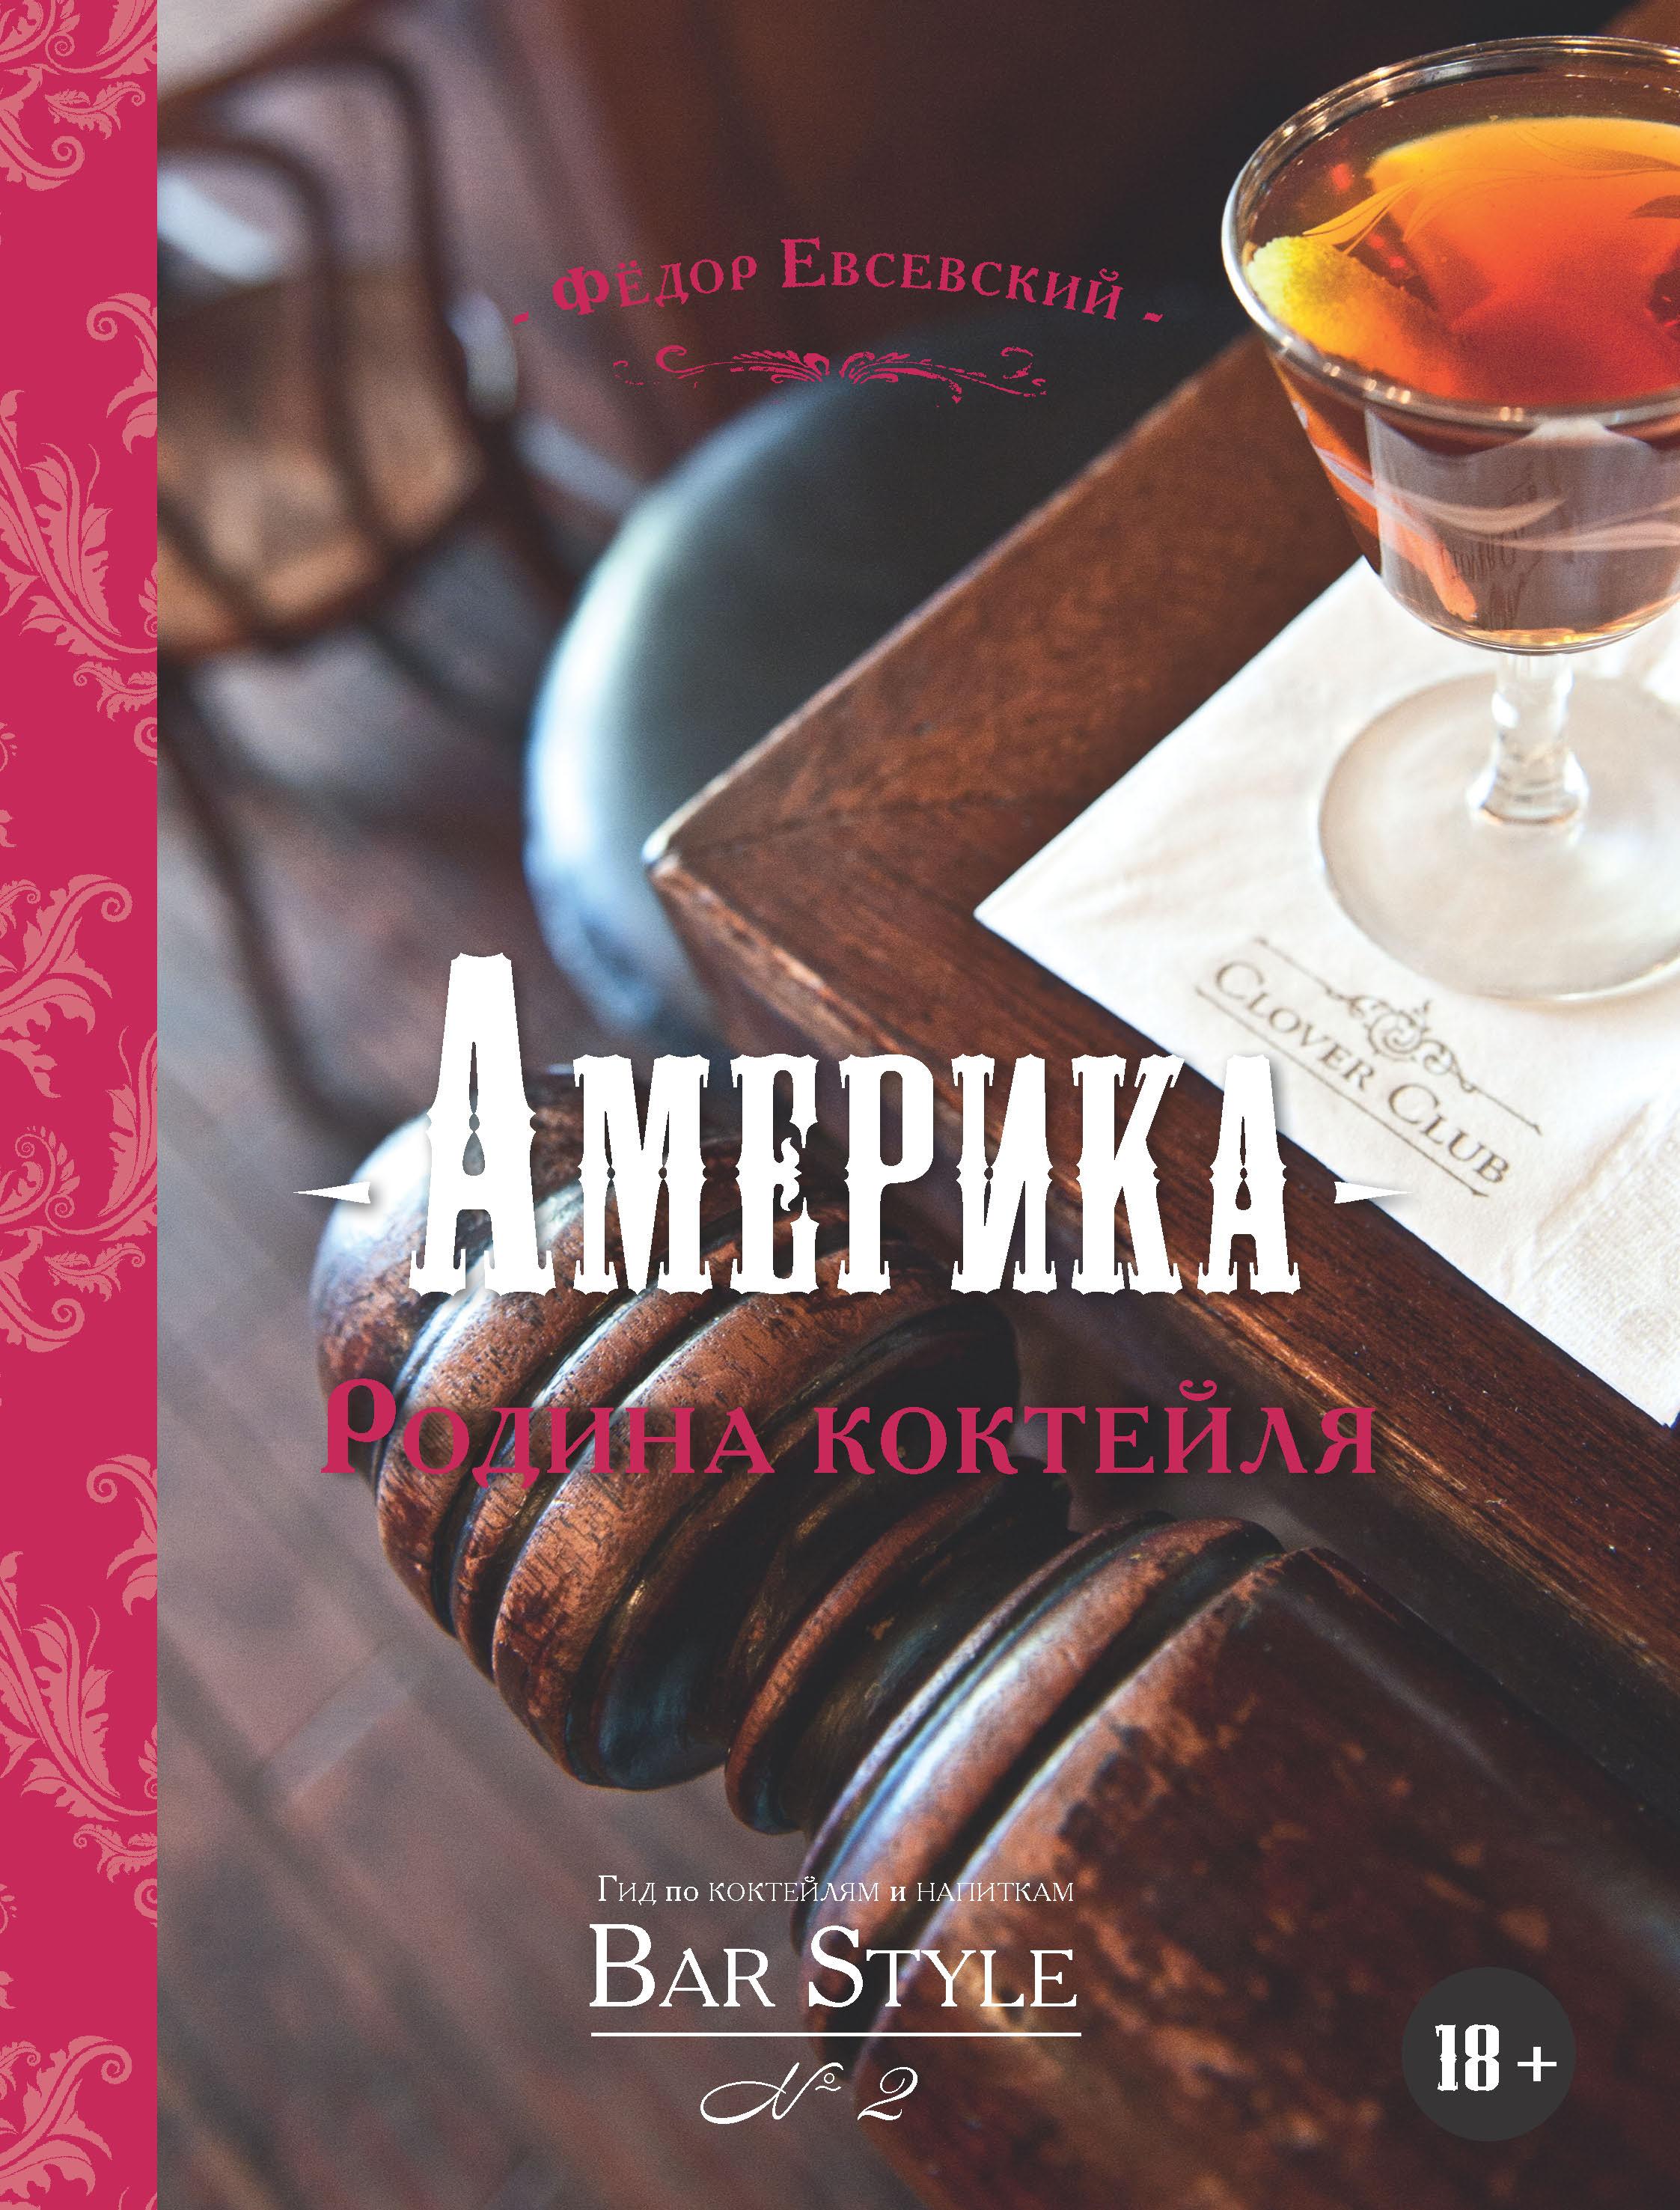 Федор Евсевский Гид по коктейлям и напиткам Bar Style. Выпуск 2. Америка – родина коктейля